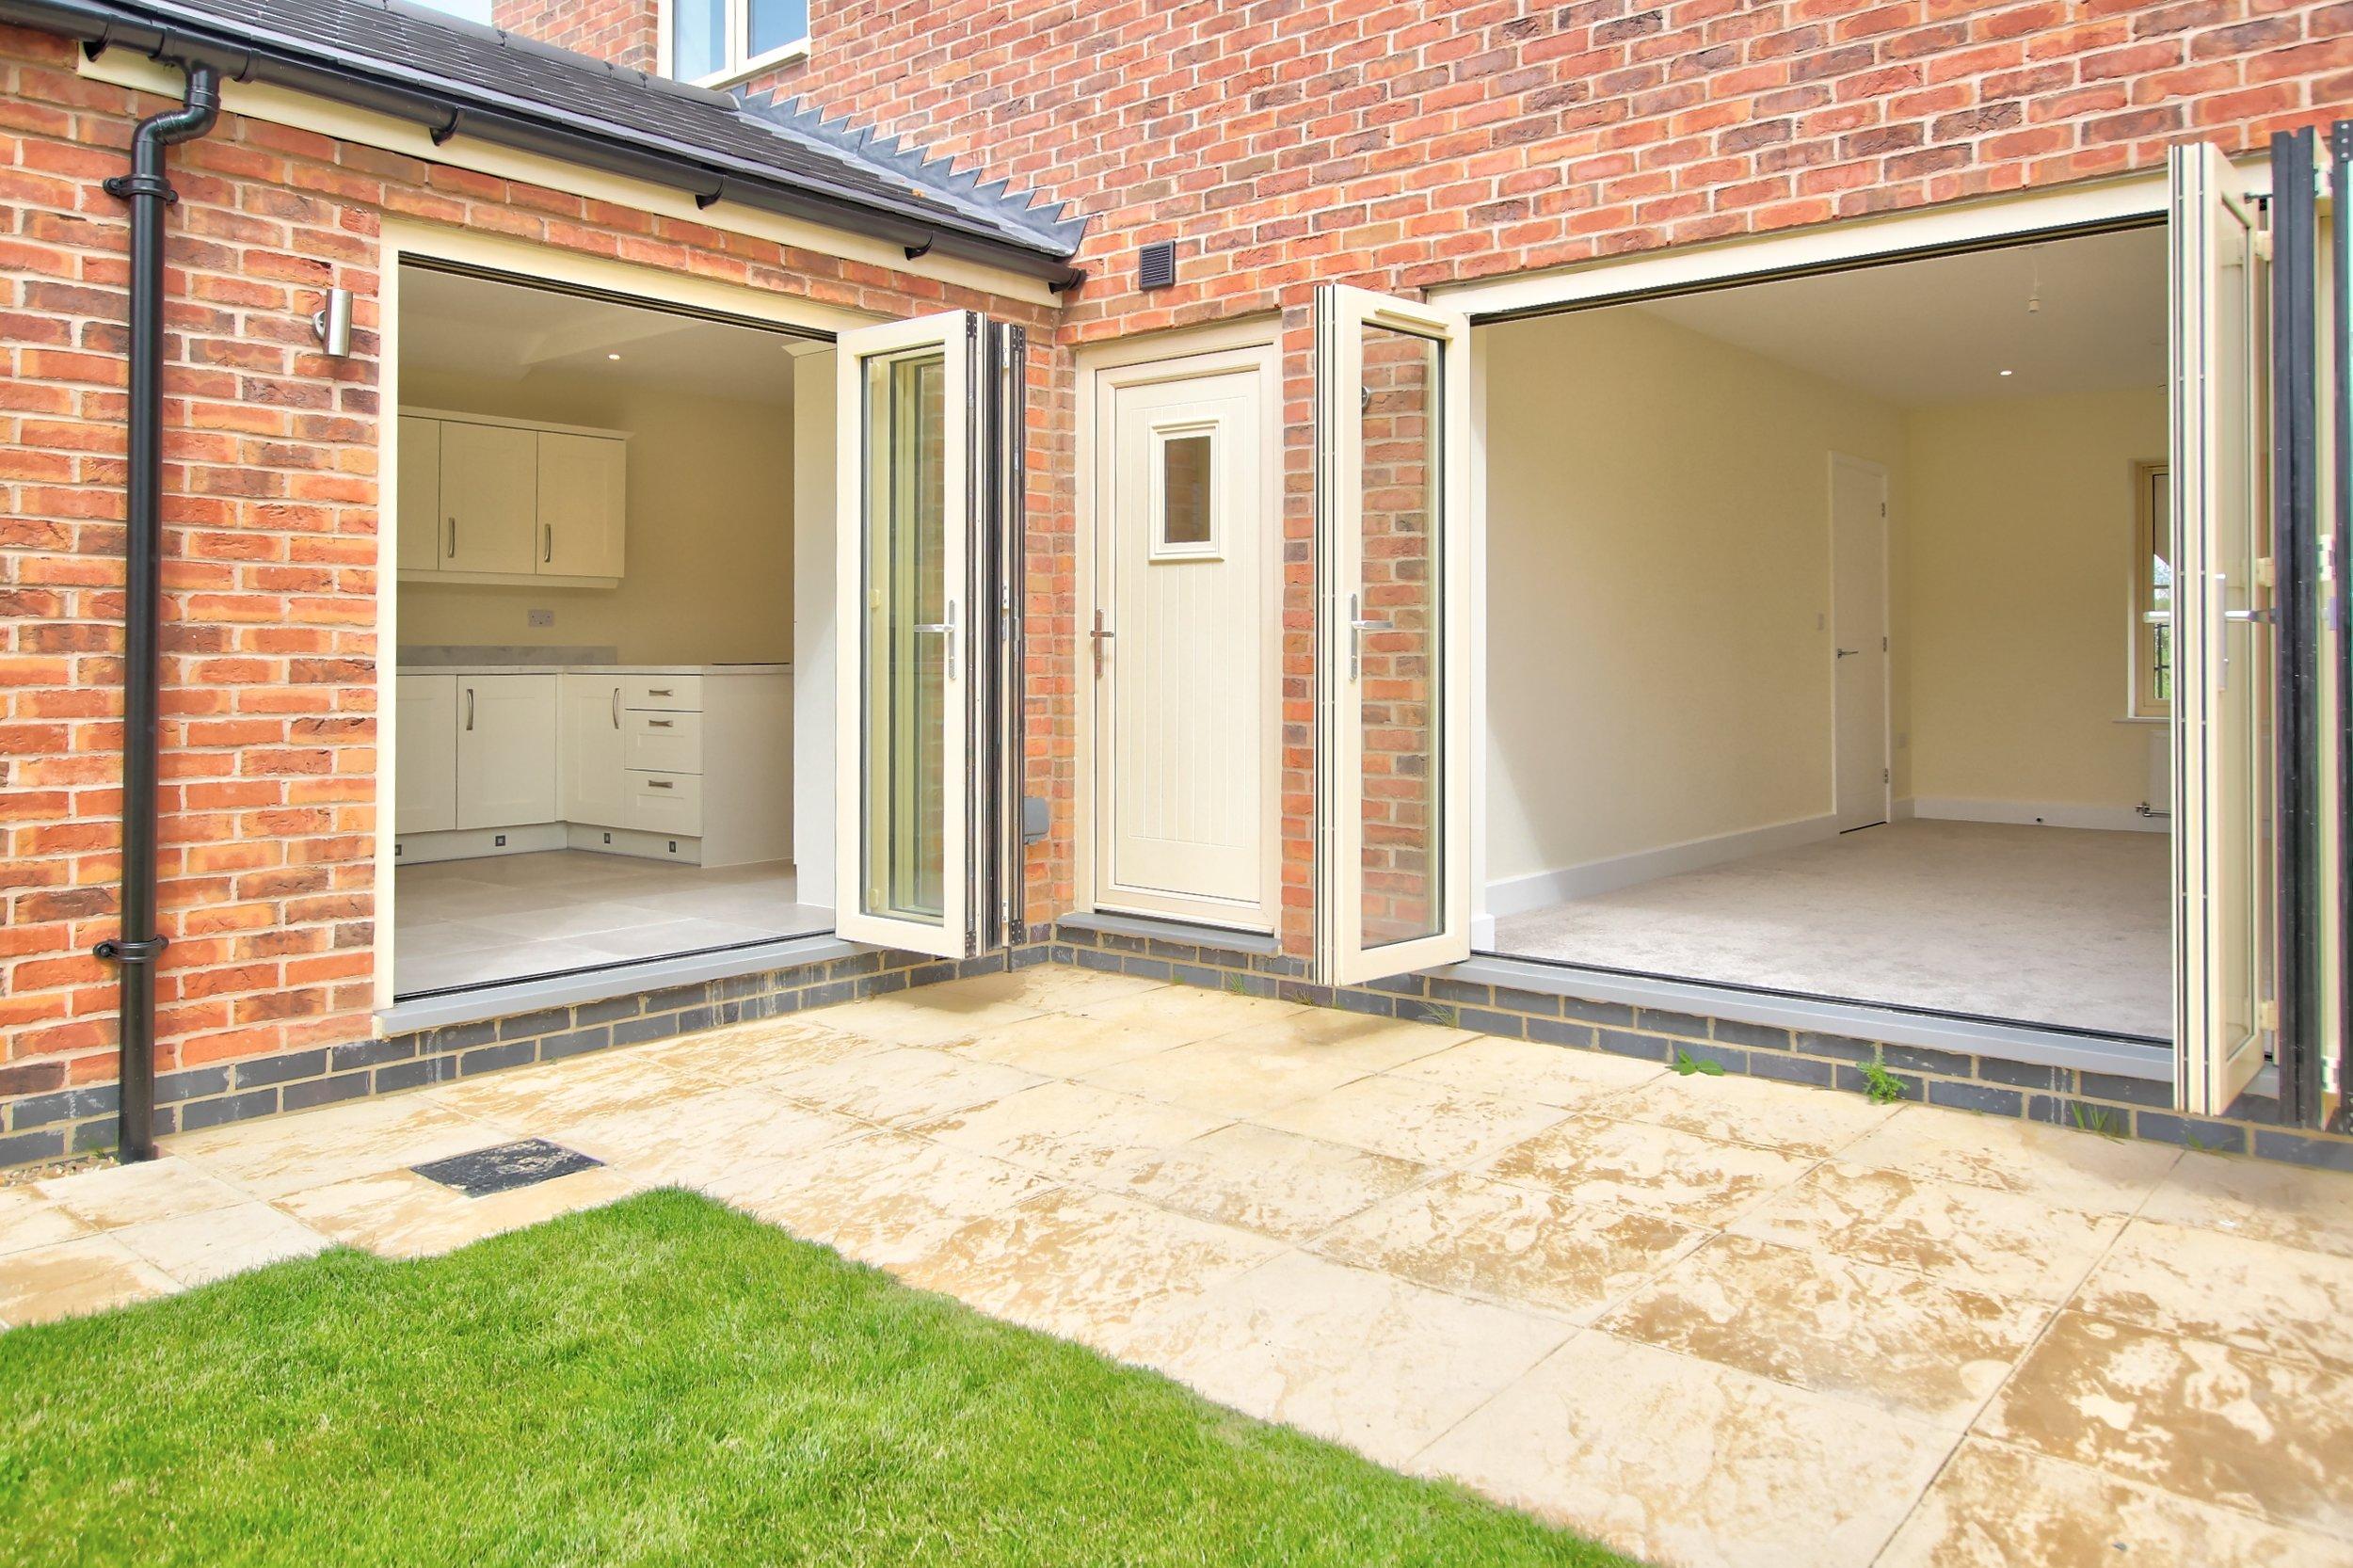 4 patio and bi folds.jpg